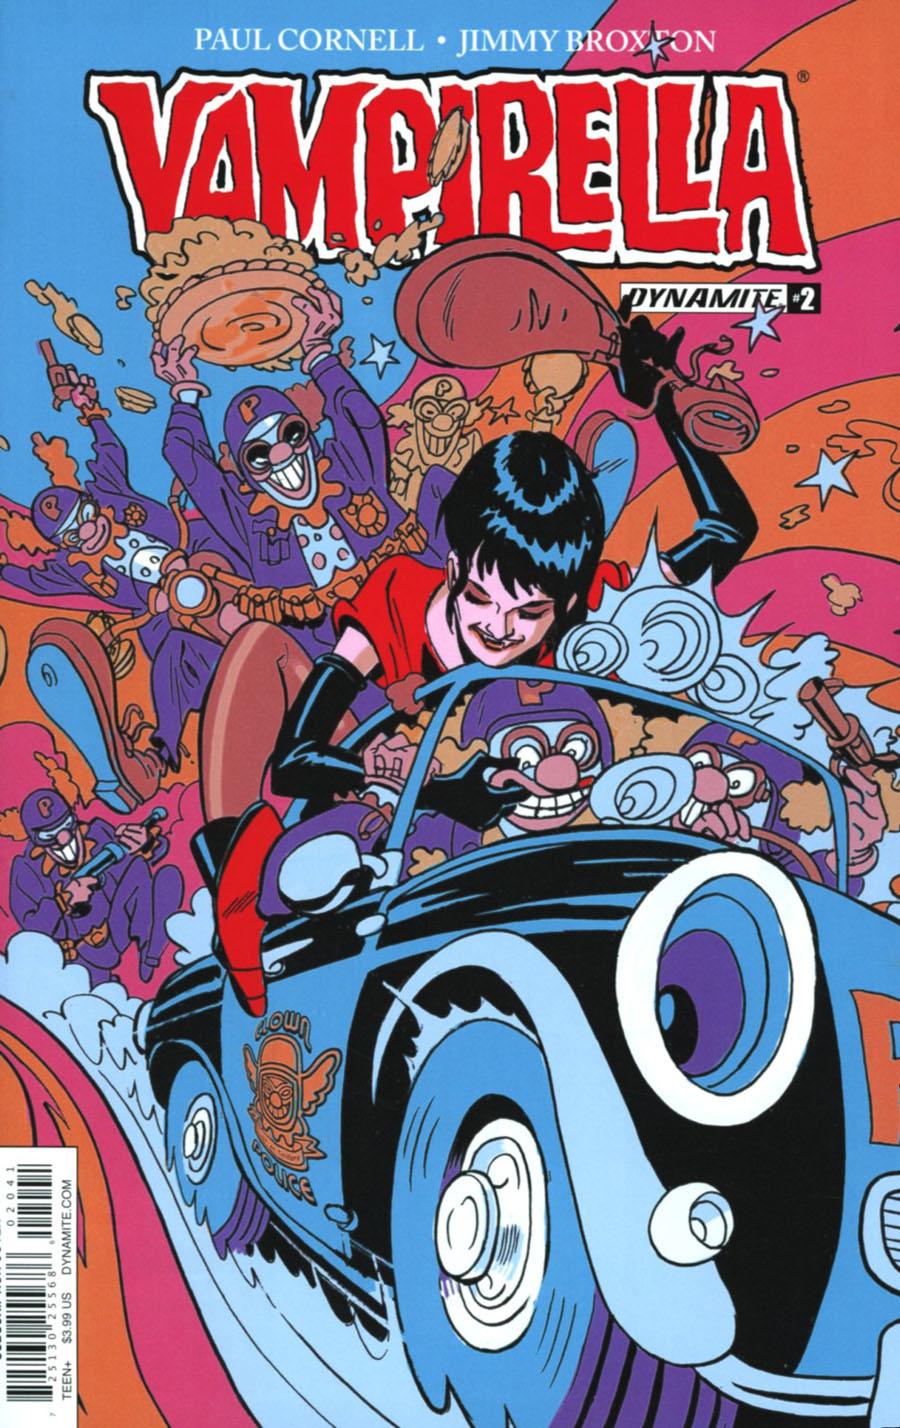 Vampirella Vol 7 #2 Cover D Variant Jimmy Broxton Subscription Cover